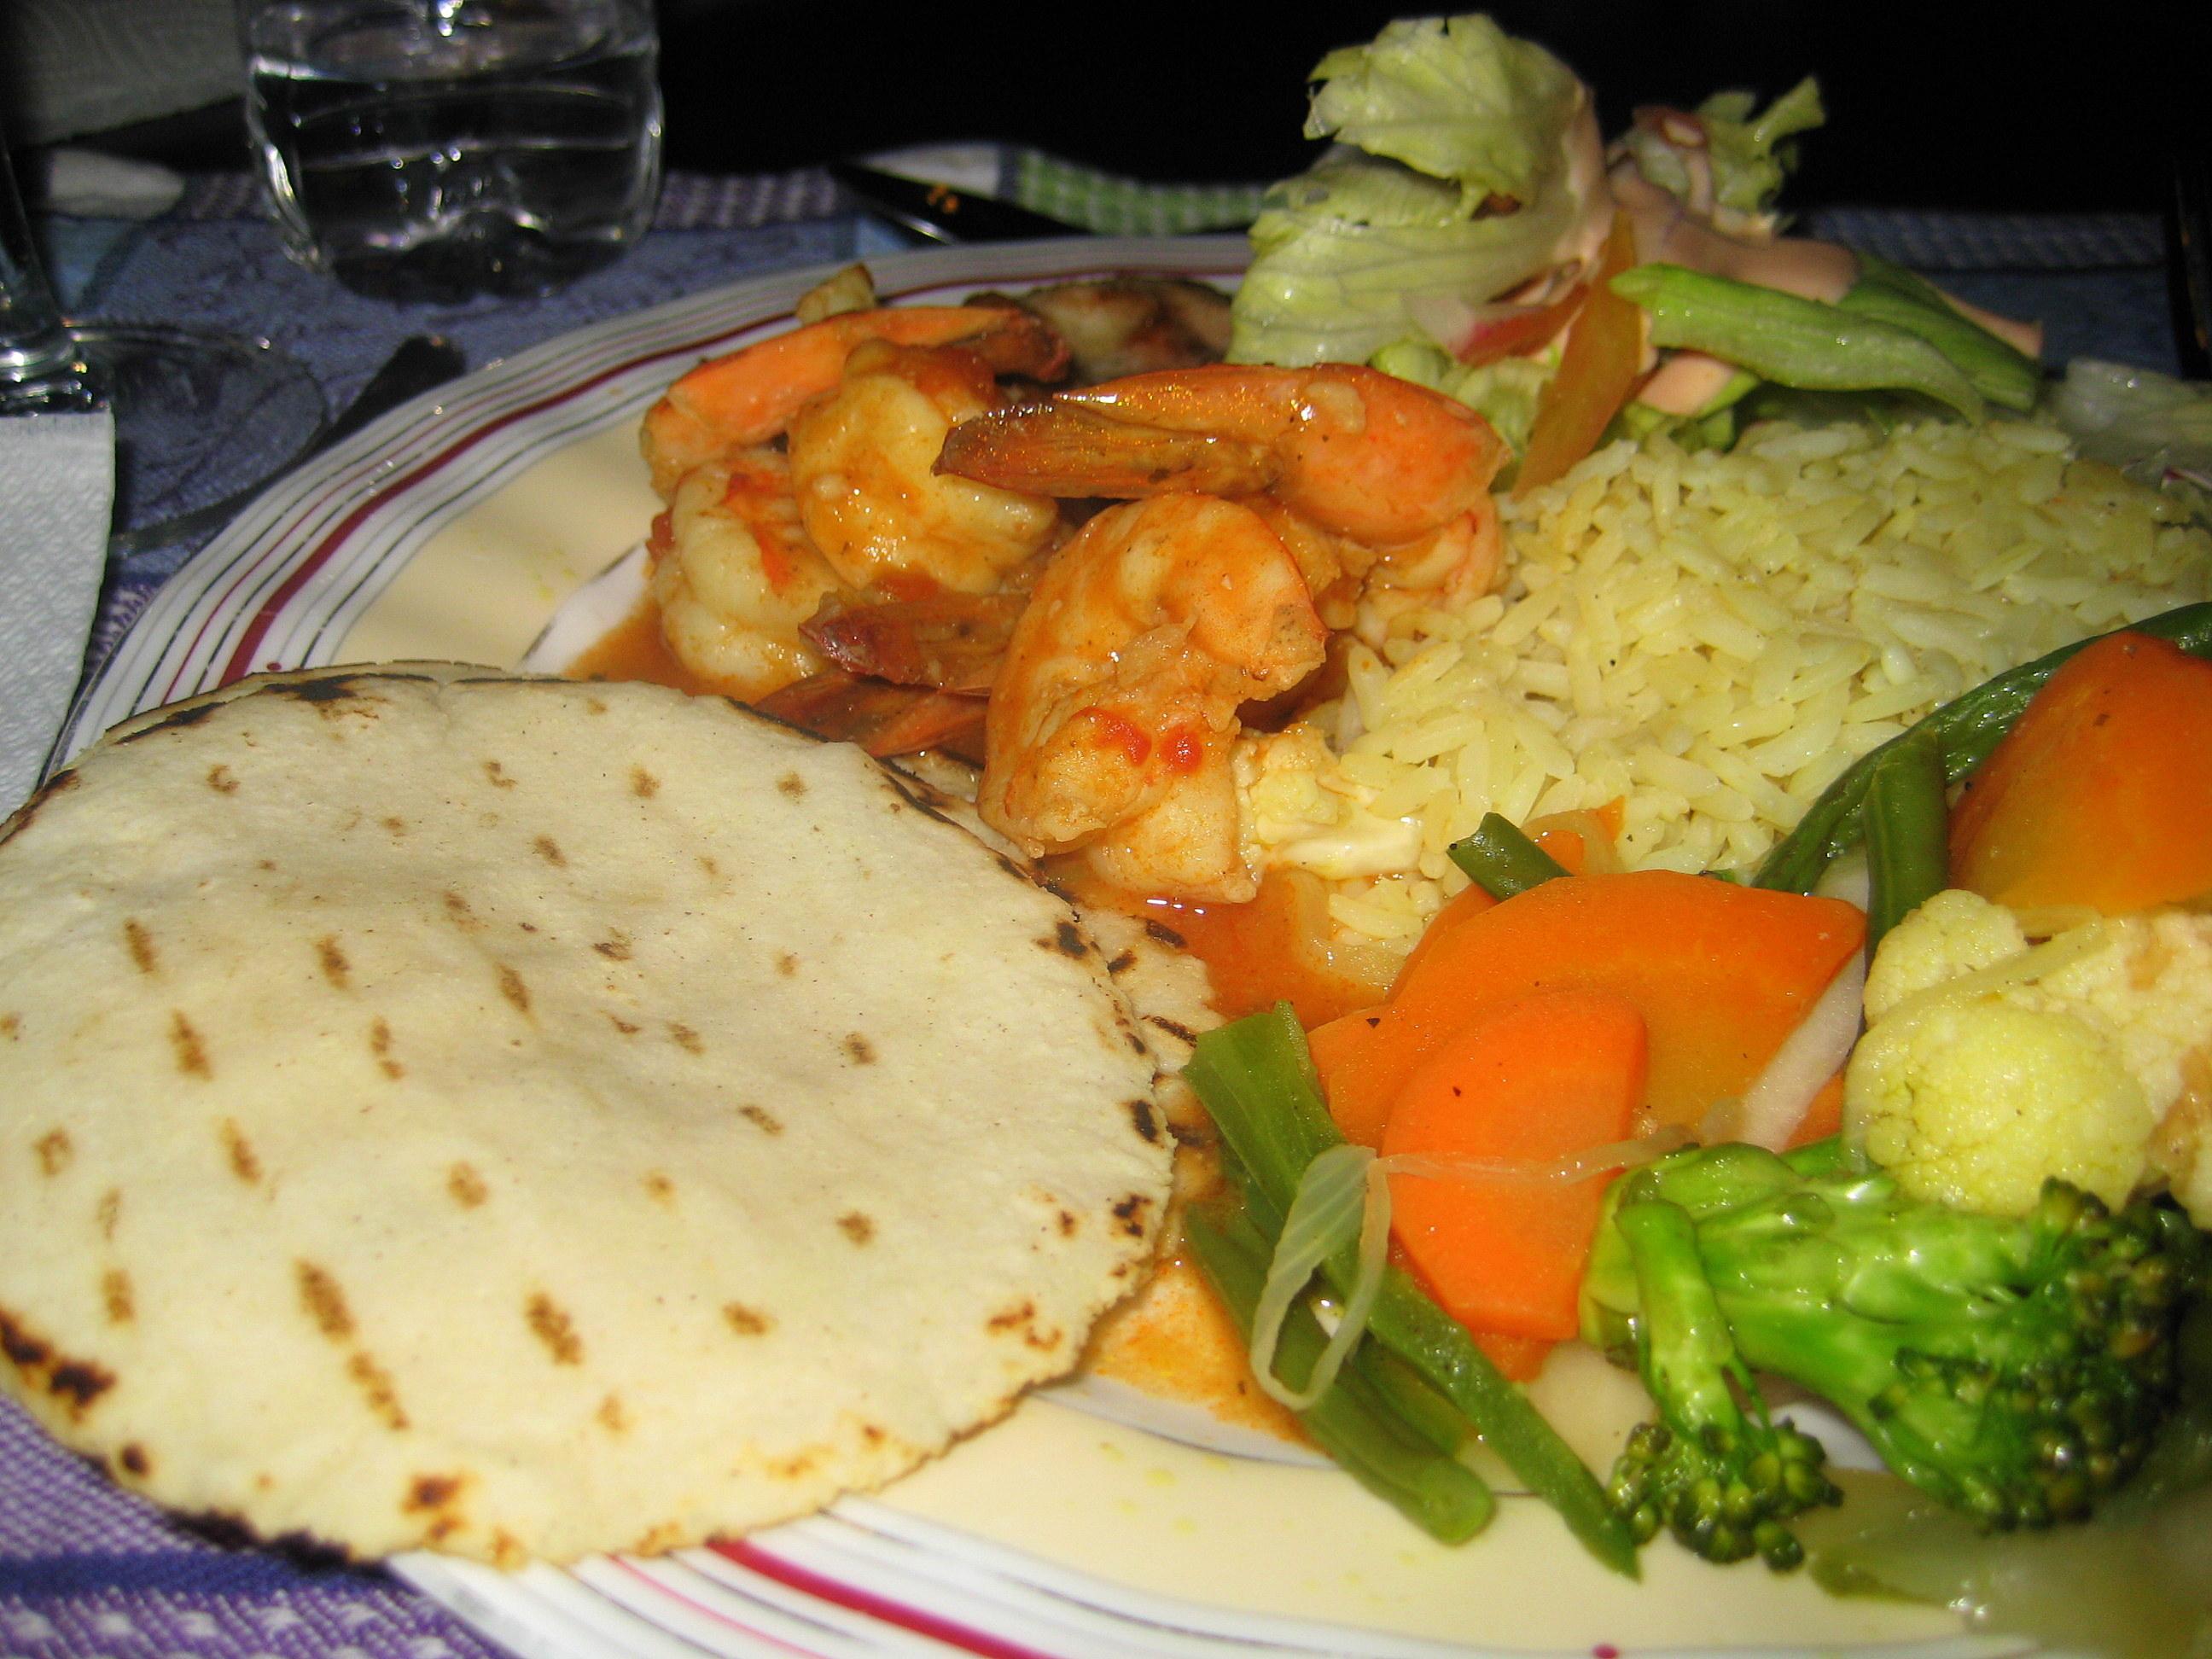 Shrimp with rice, veggies and tortillas